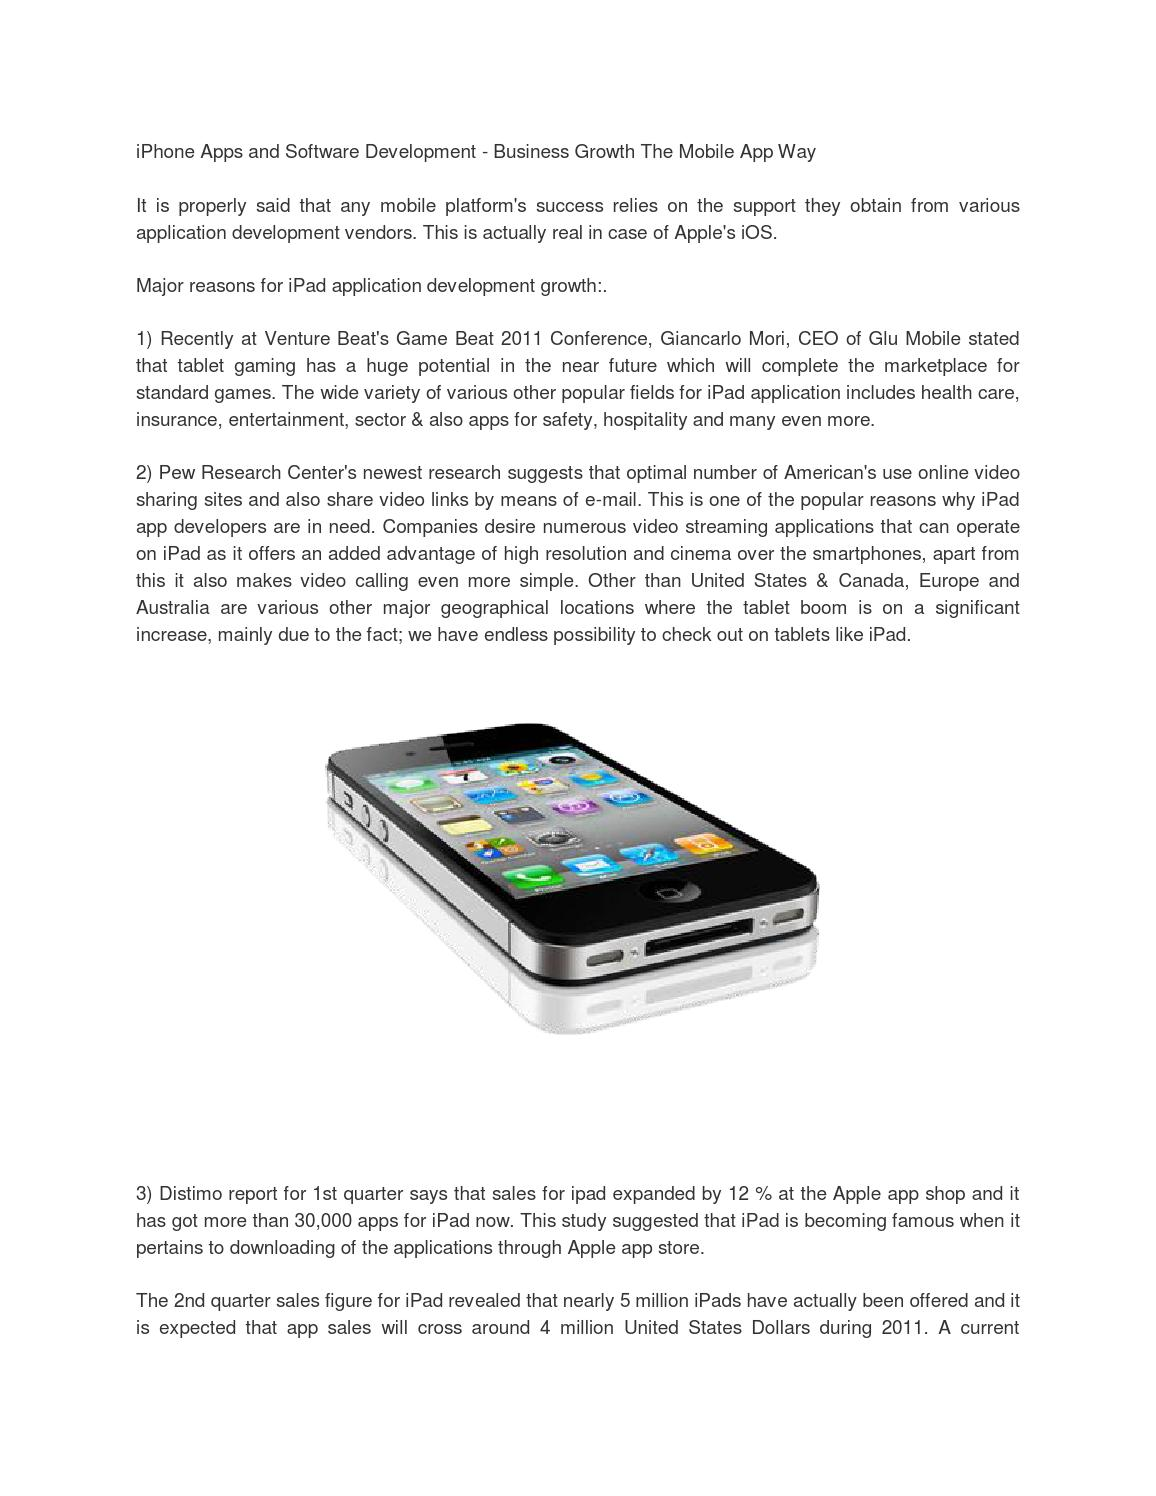 iphone web development by Cheijoyo - issuu